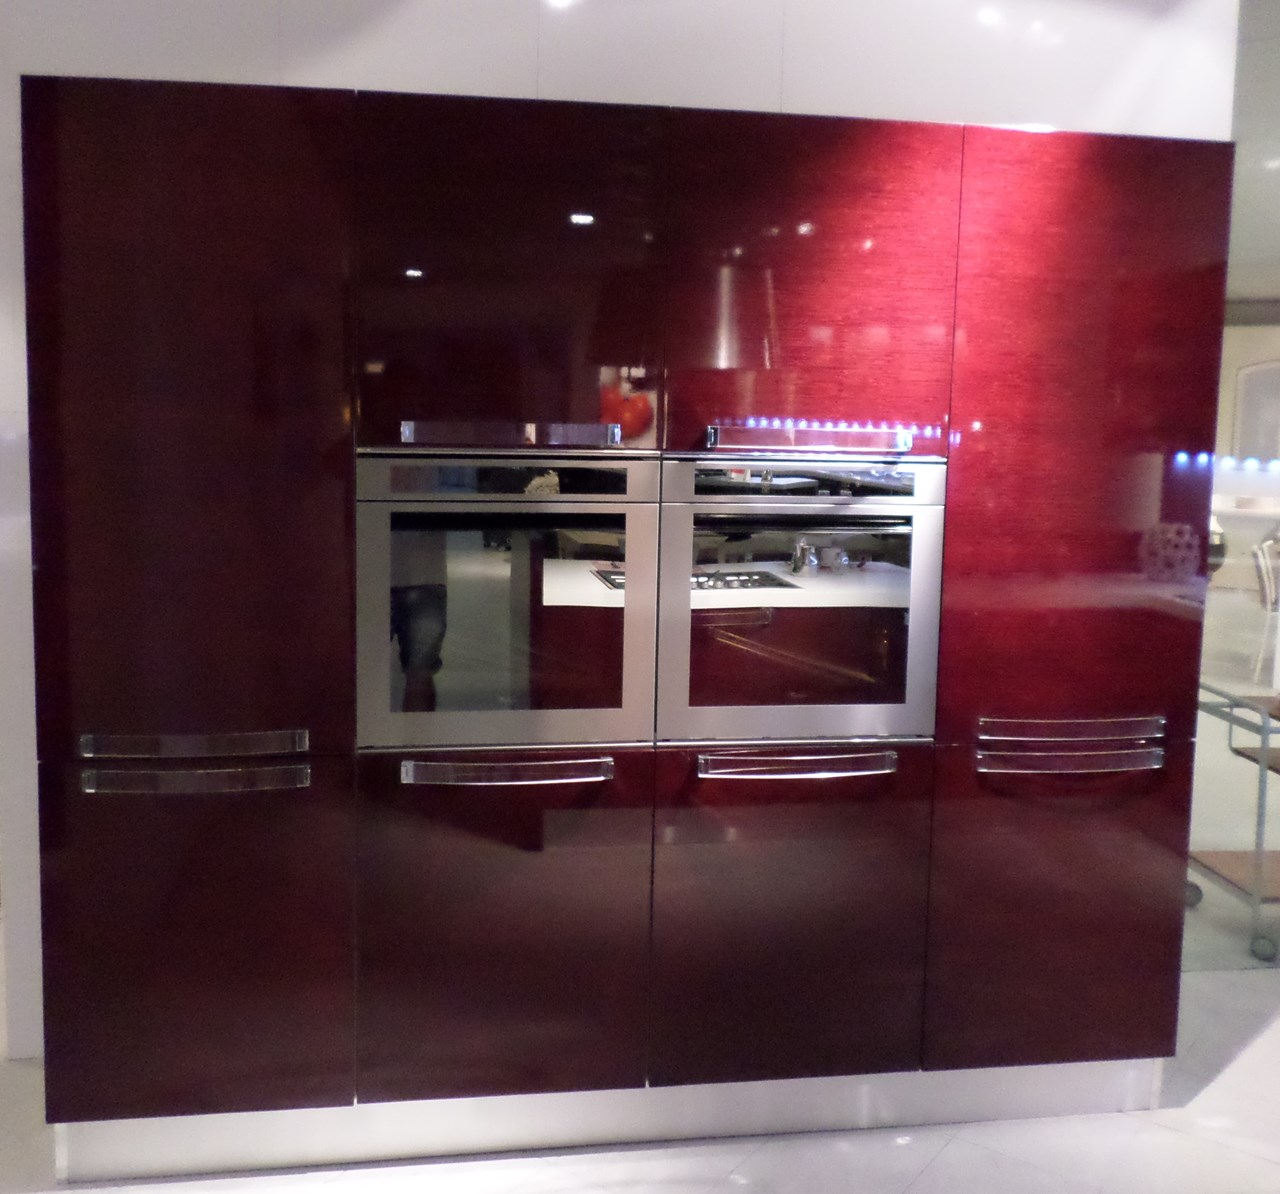 Extra Avant Veneta Cucine.Kerocalor Stufe Stufe A Legna Stufe A Pellet Cucine Salotti